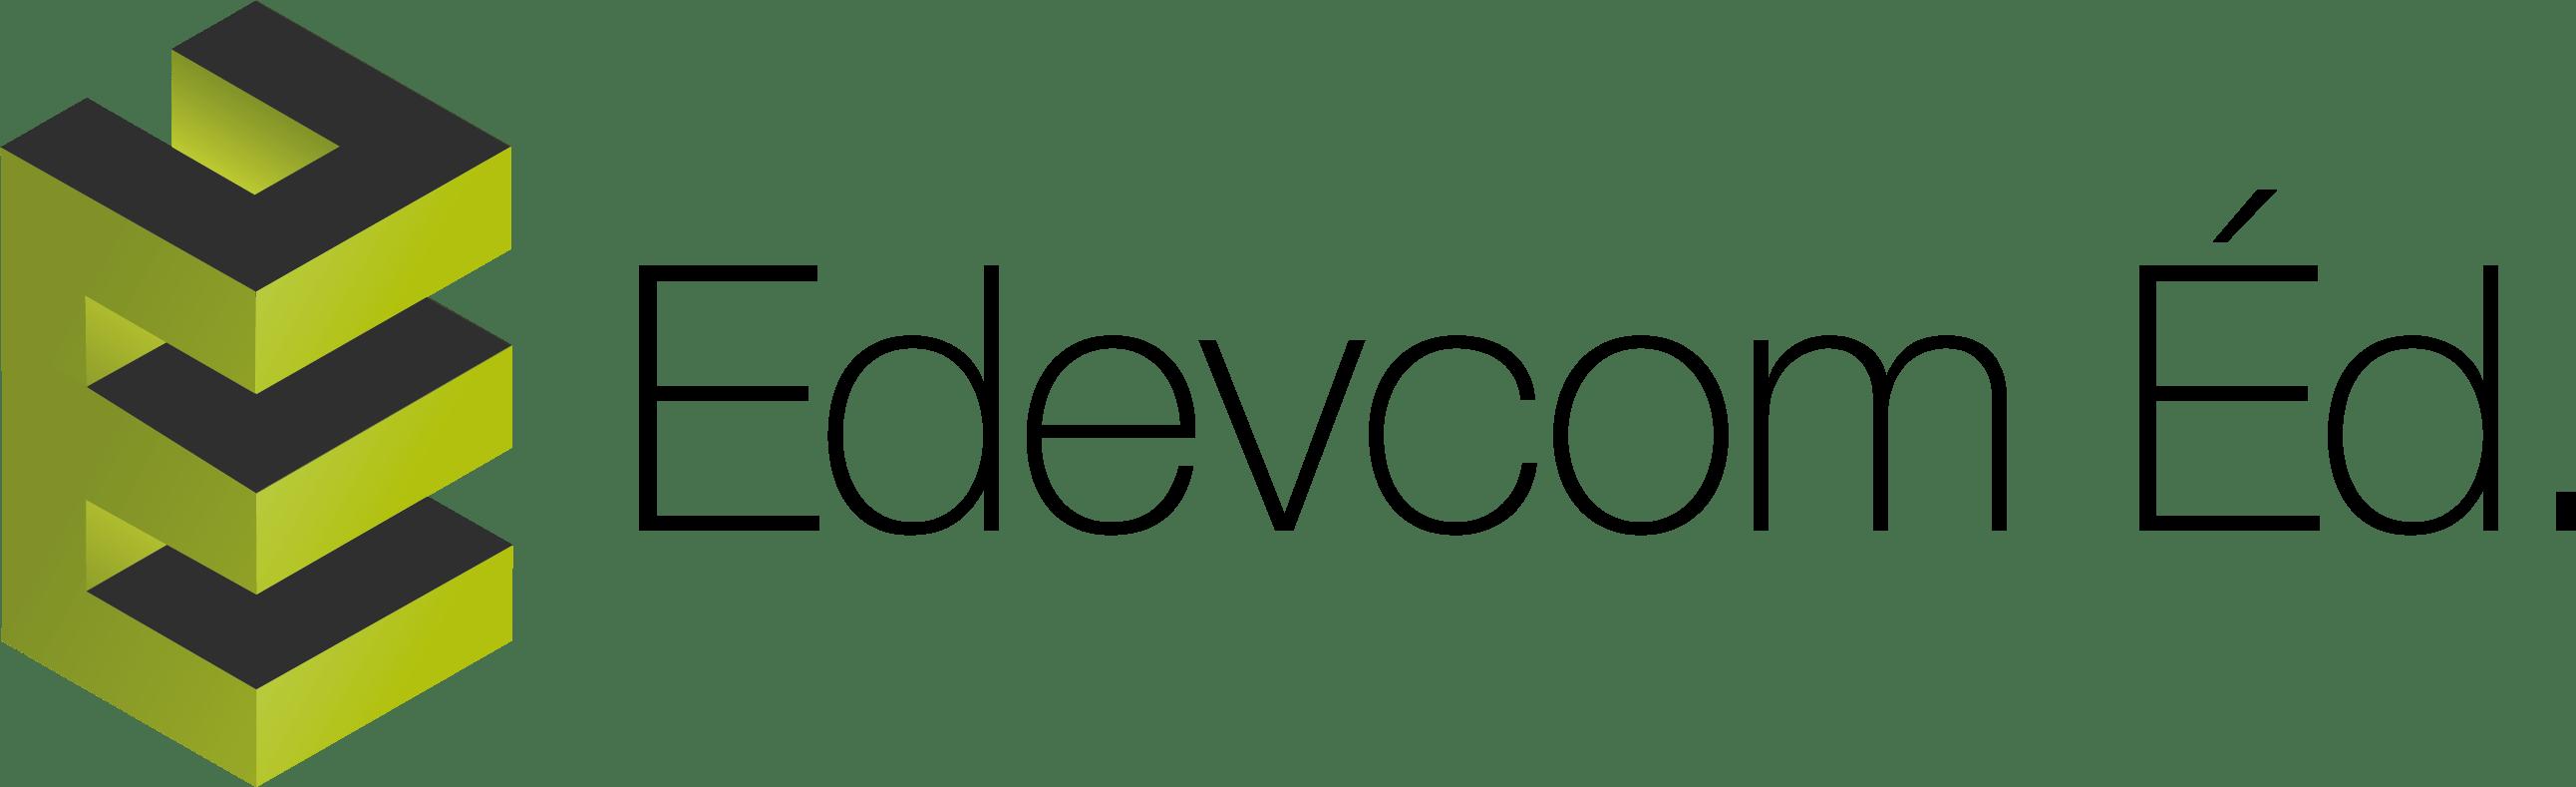 Edevcom Editions